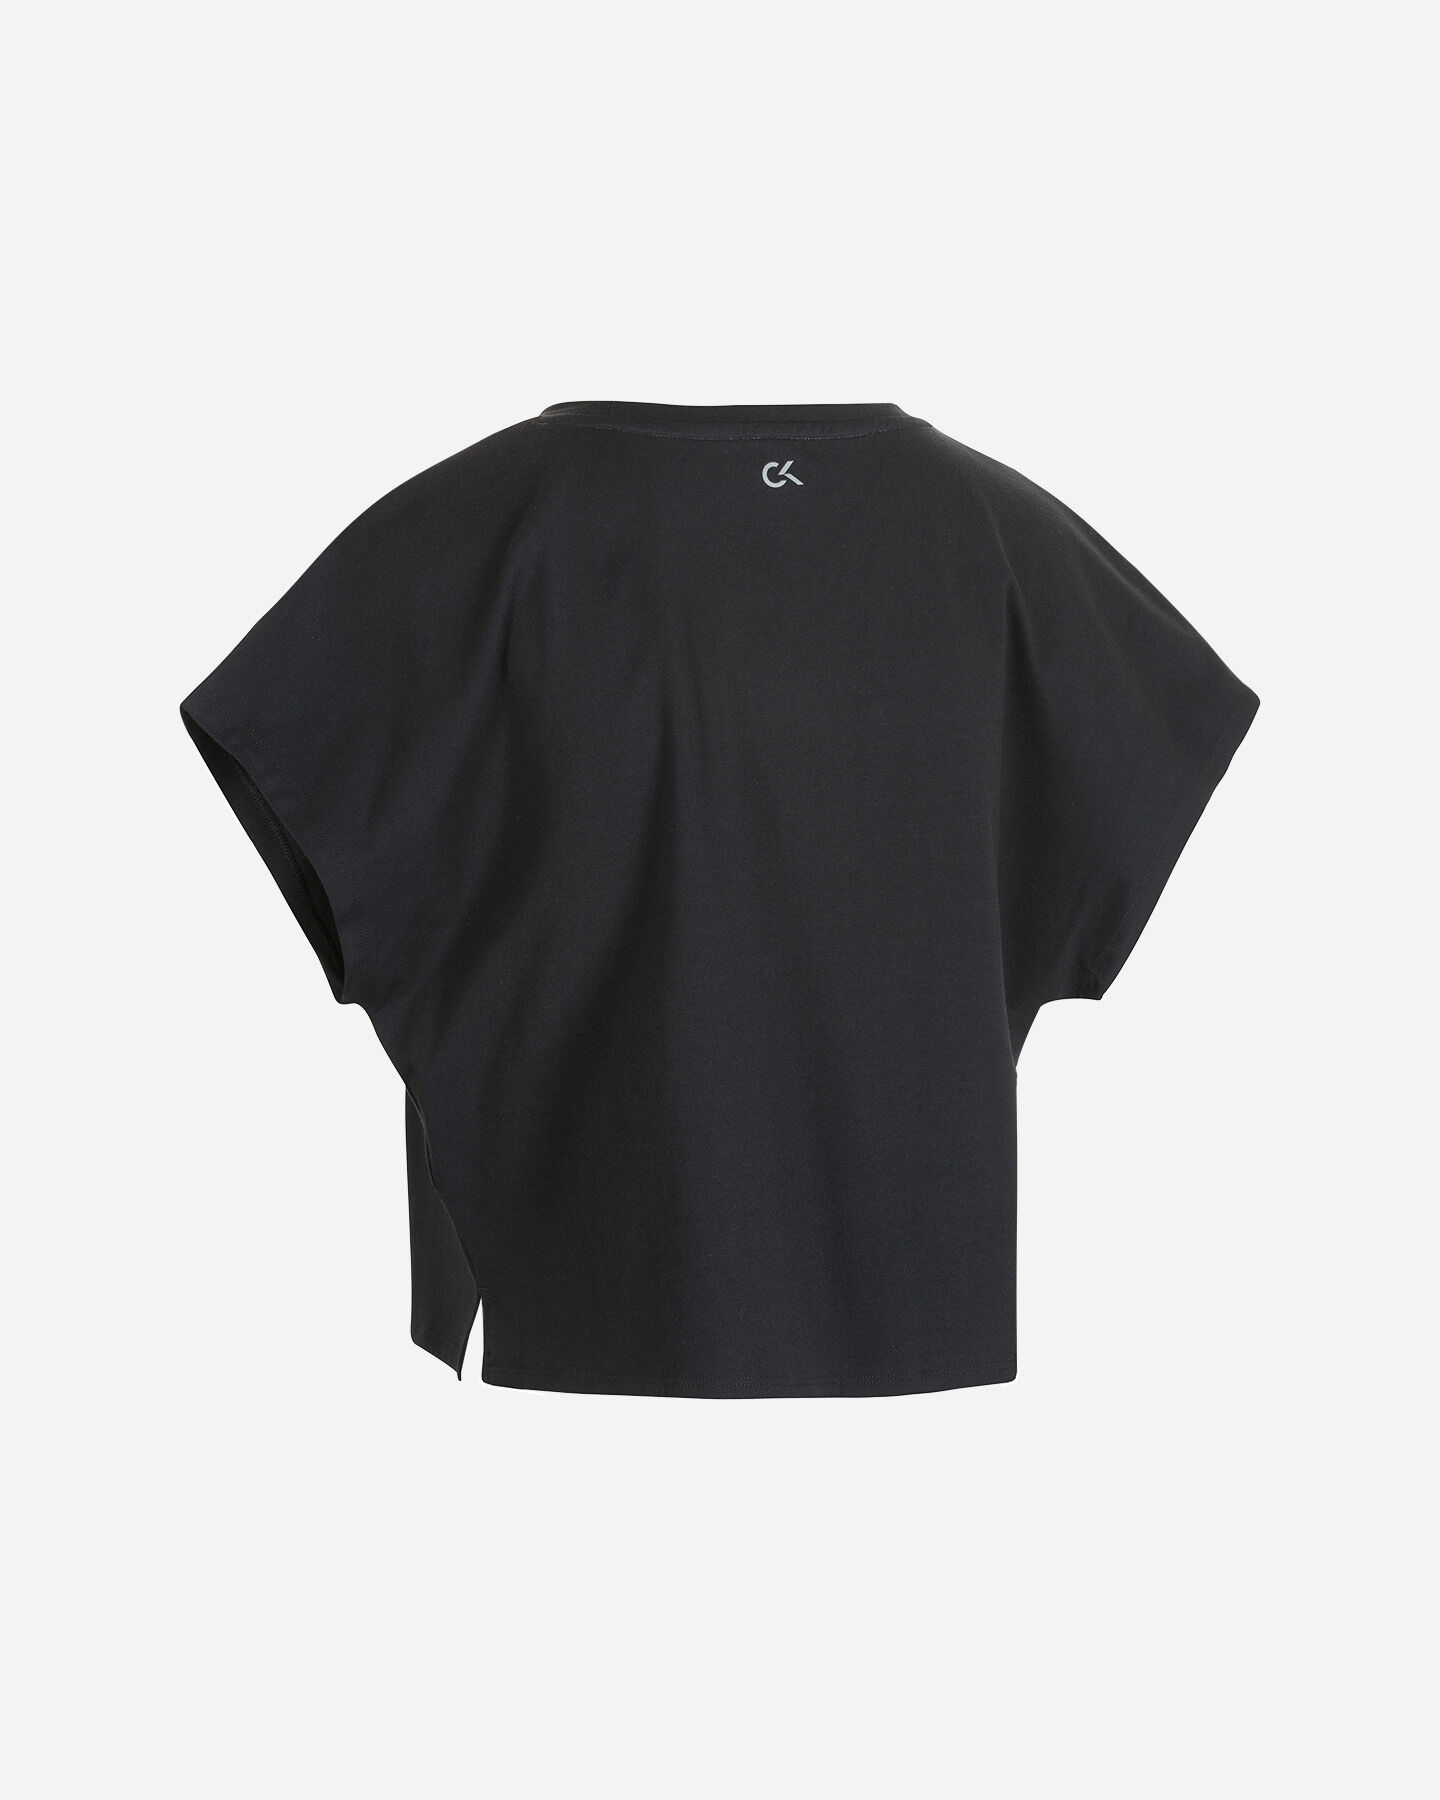 T-Shirt CALVIN KLEIN MC LARGE LOGO W S4079694 scatto 1